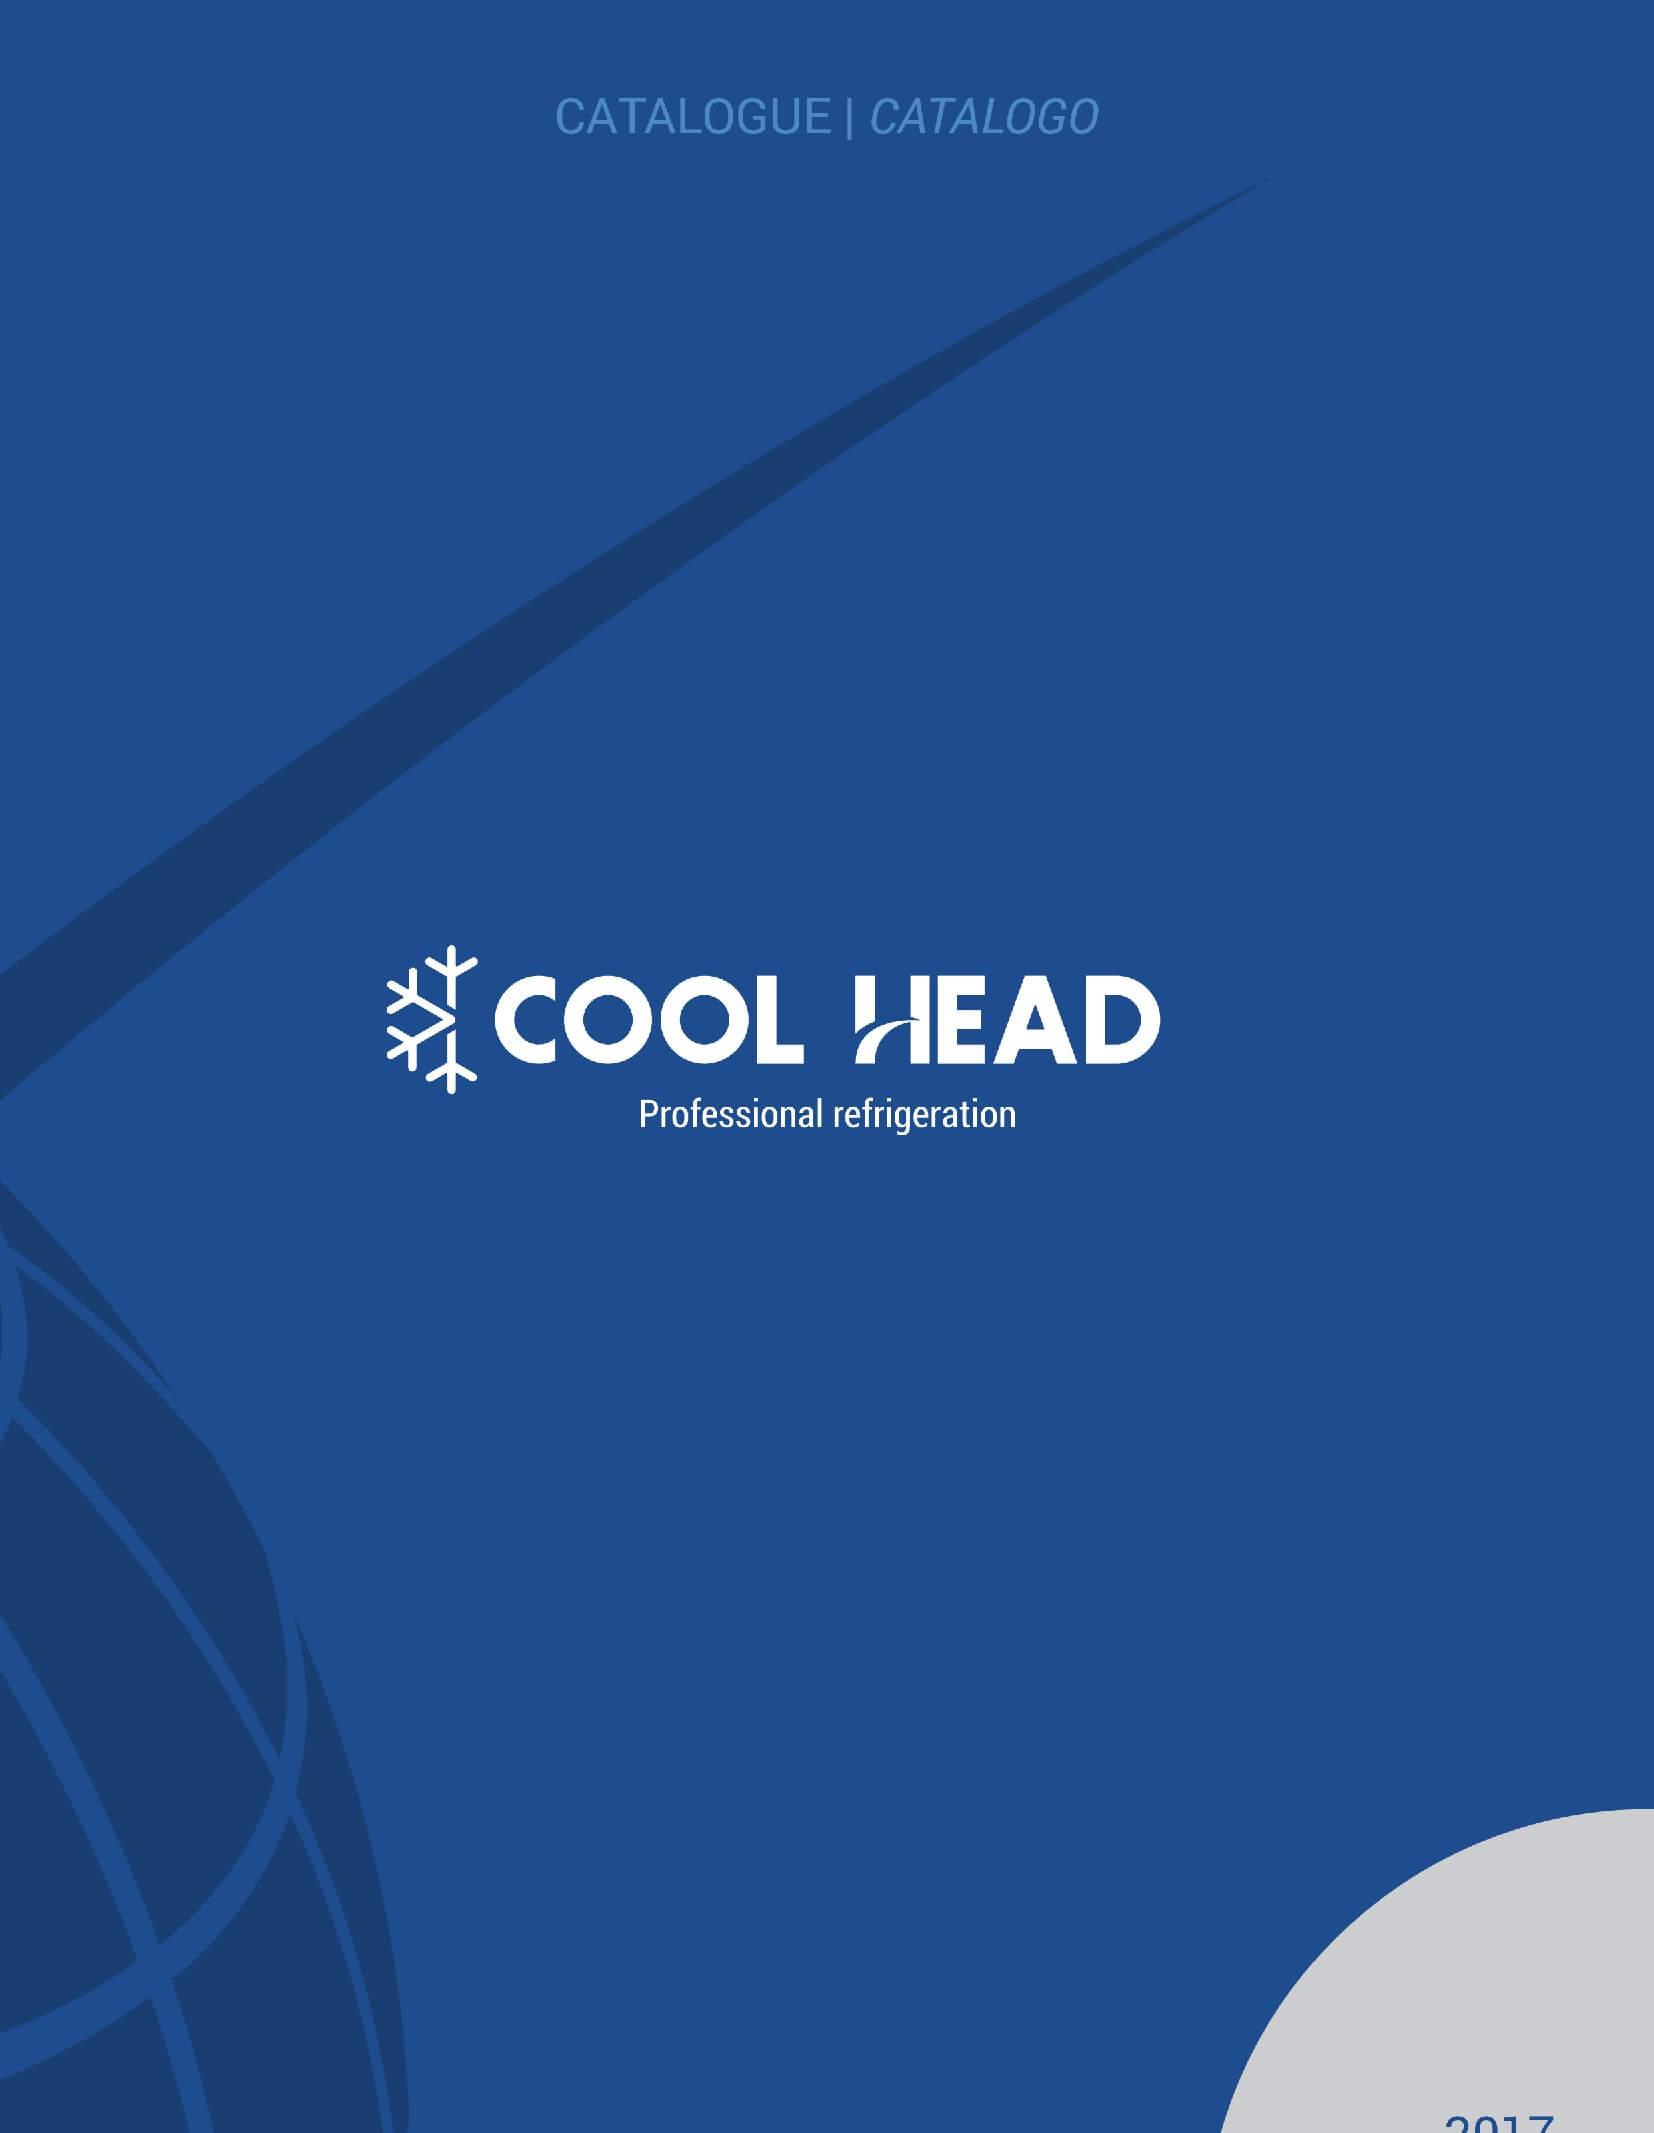 Catalogo 2018 Cool Head